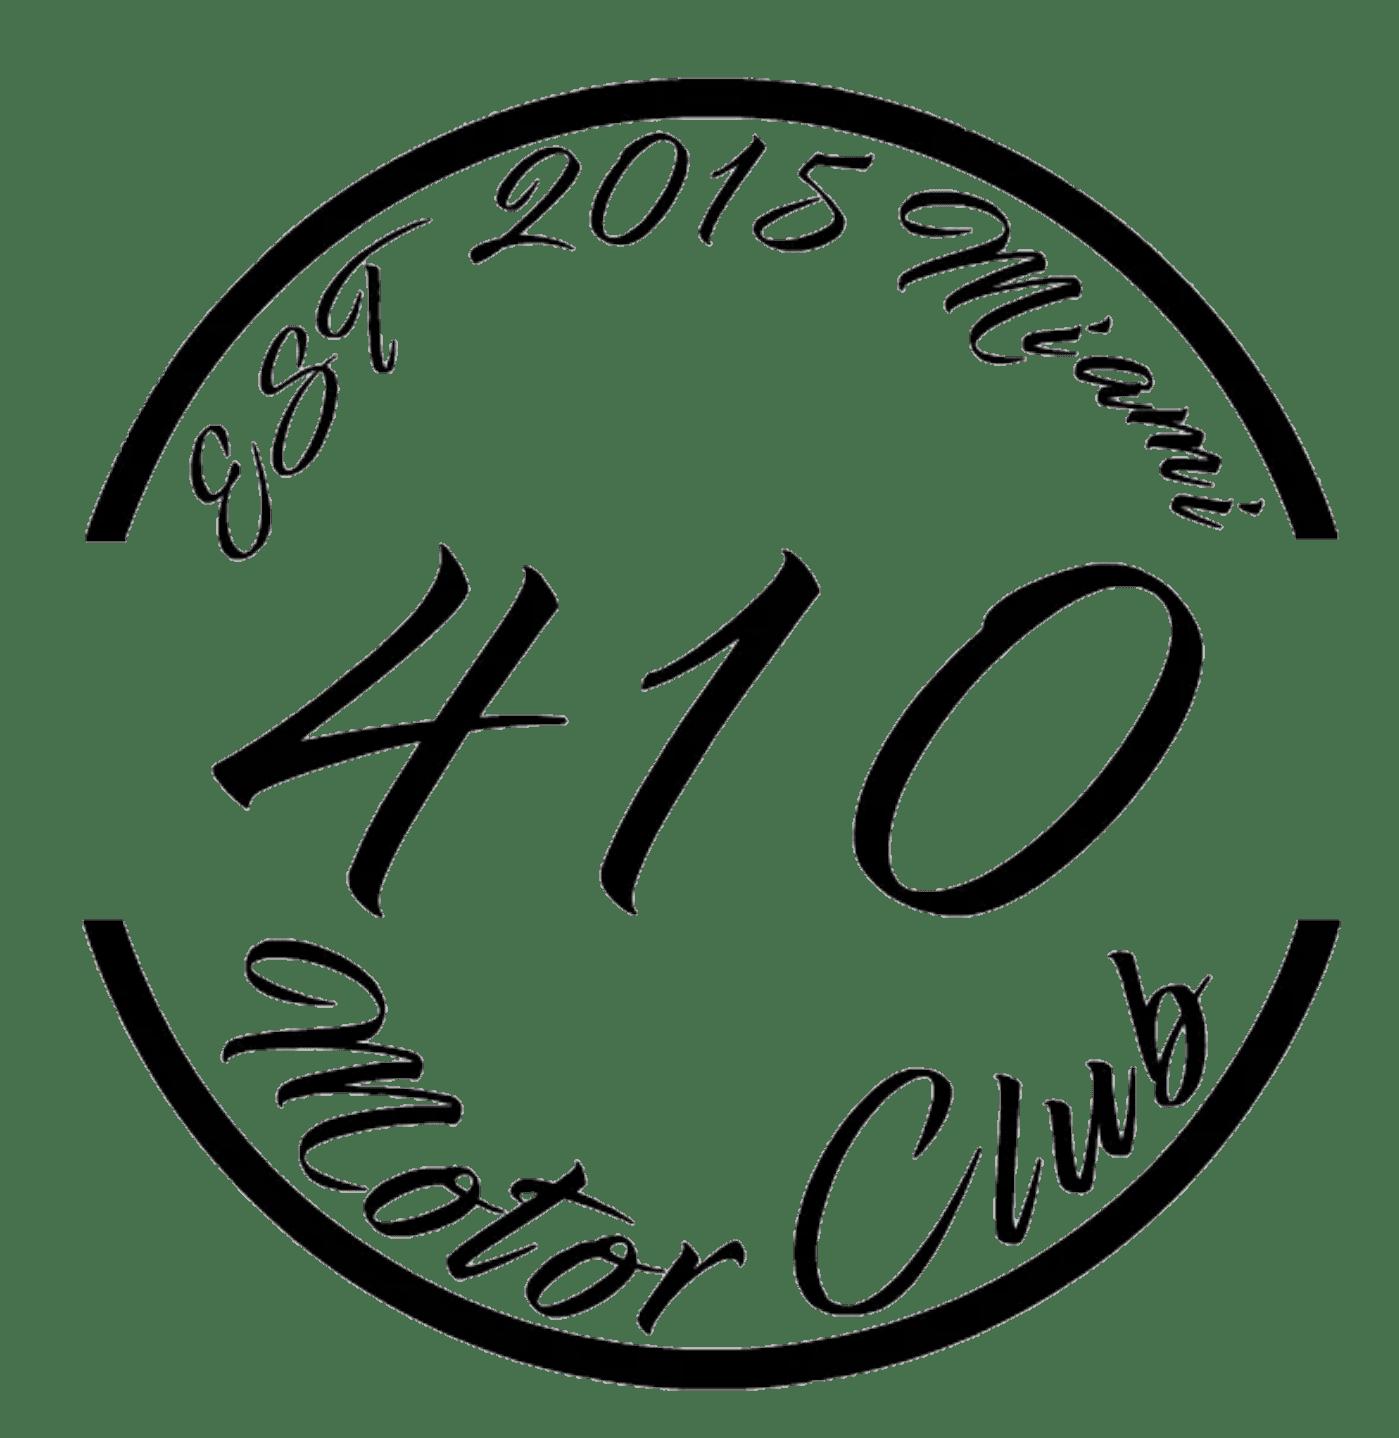 410 Circular Badge Decal Premium Quality Vinyl Status